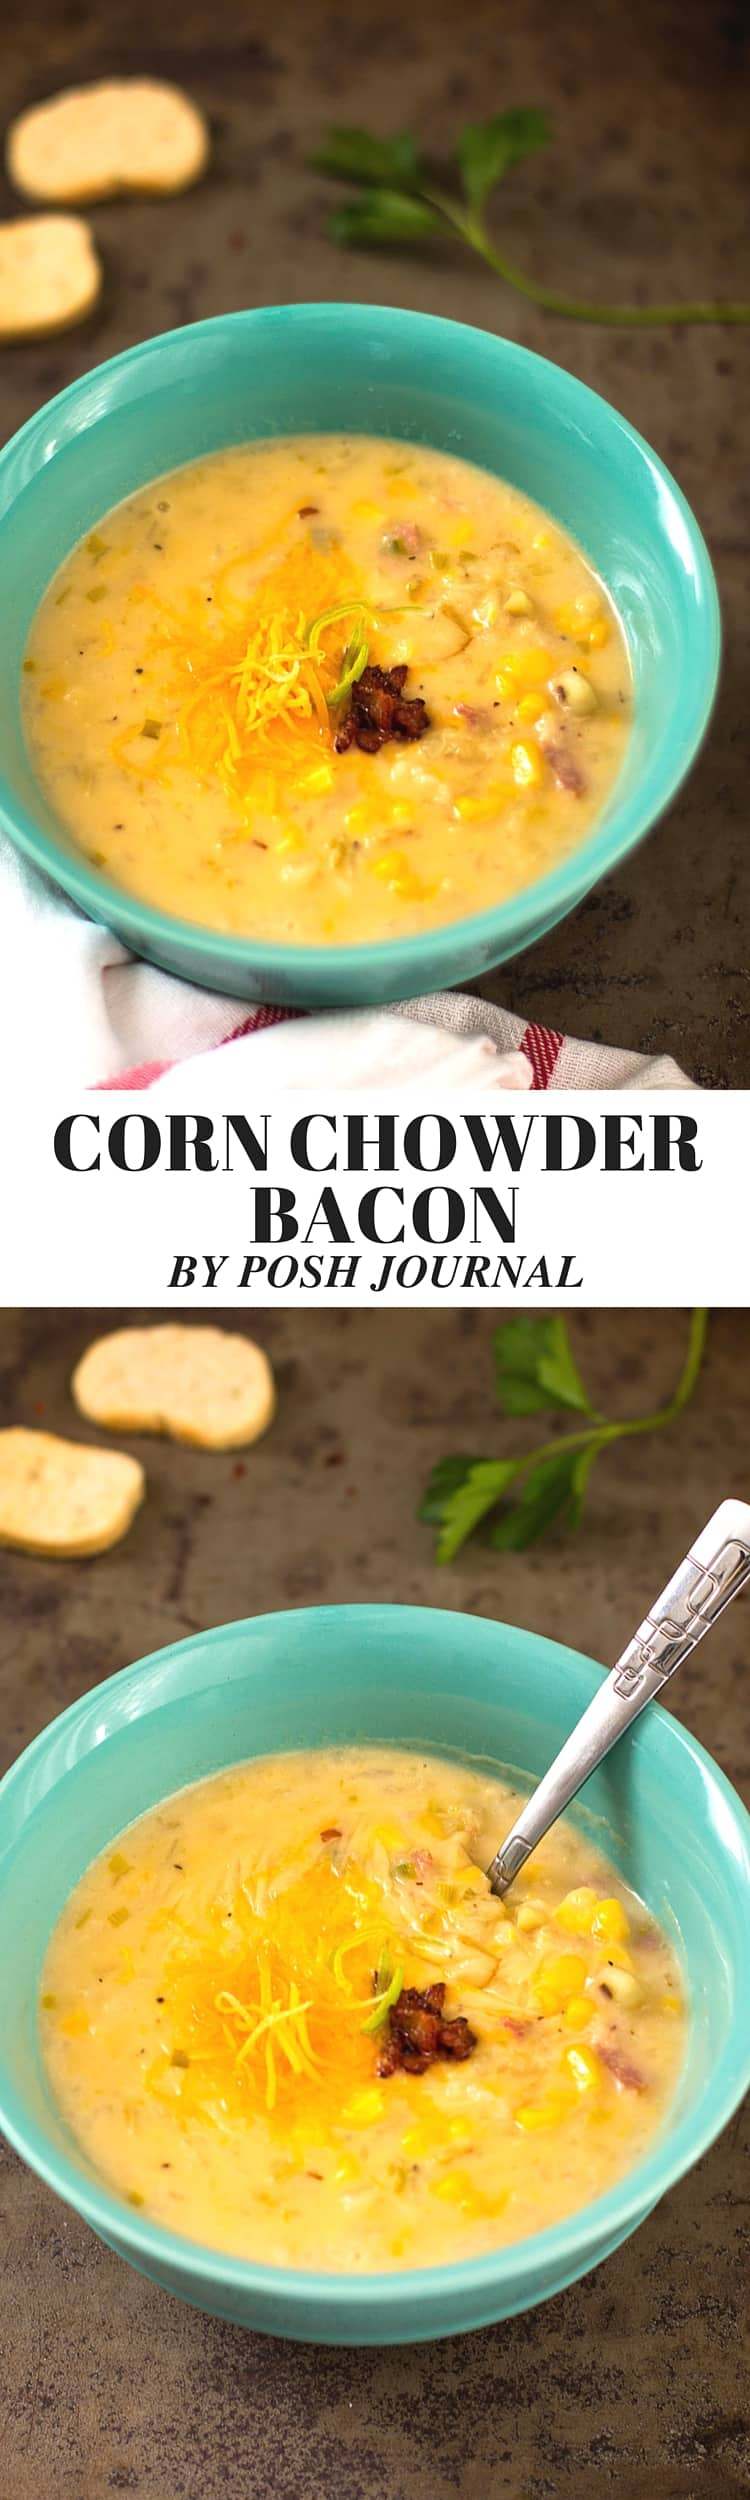 corn chowder bacon recipe